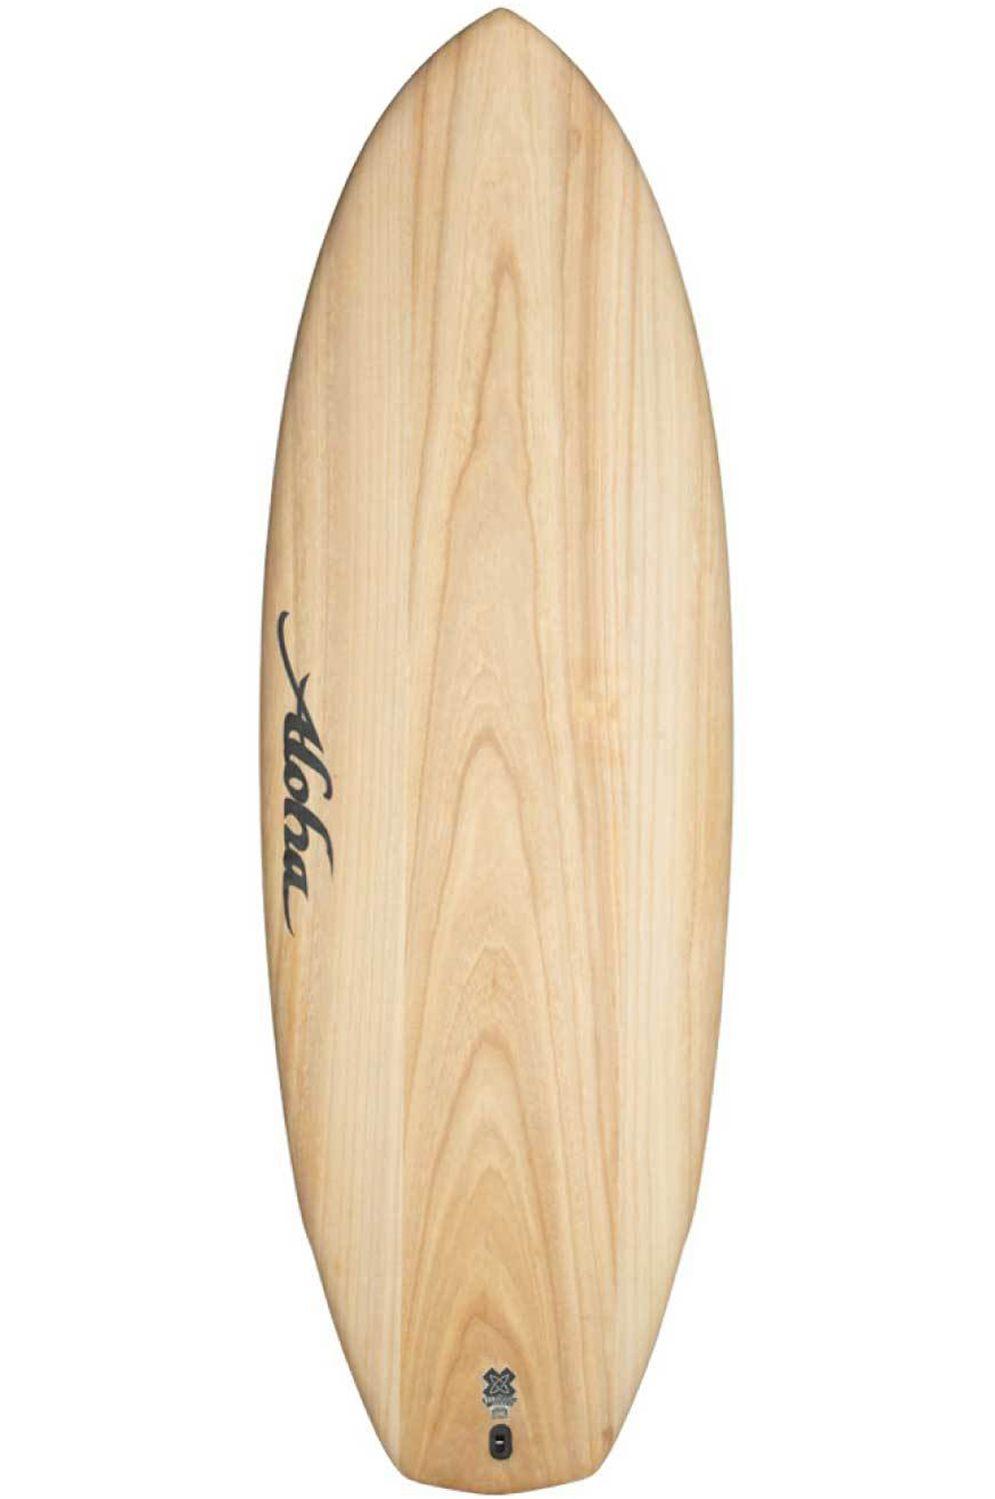 Prancha Surf Aloha 5'8 BLACK PANDA ECOSKIN Squash Tail - White FCS II Multisystem 5ft8